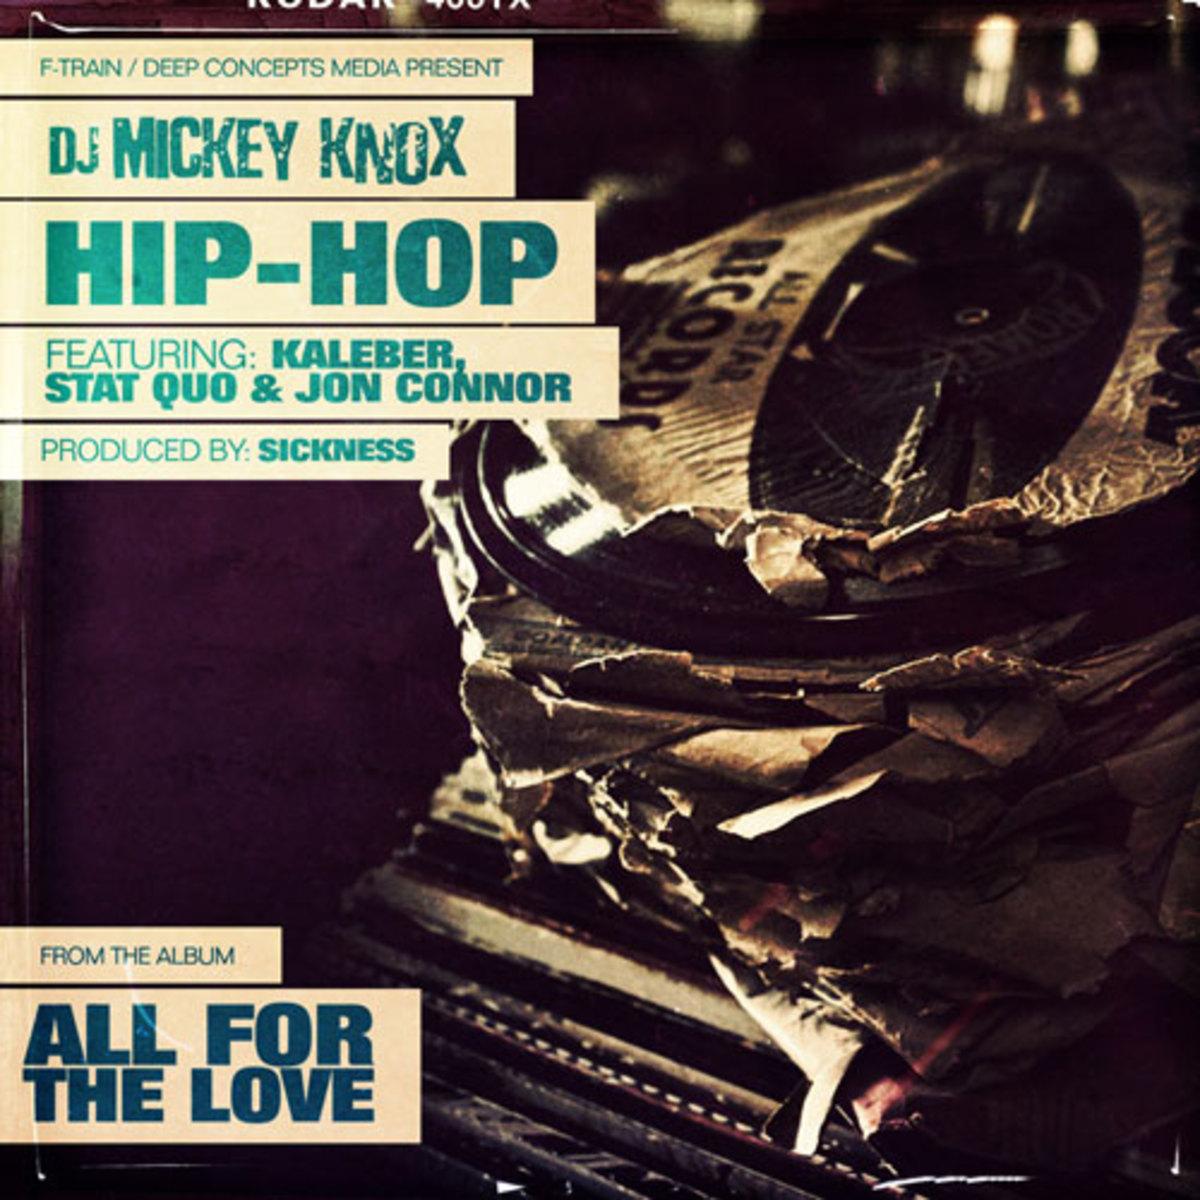 djmickeyknox-hiphop.jpg